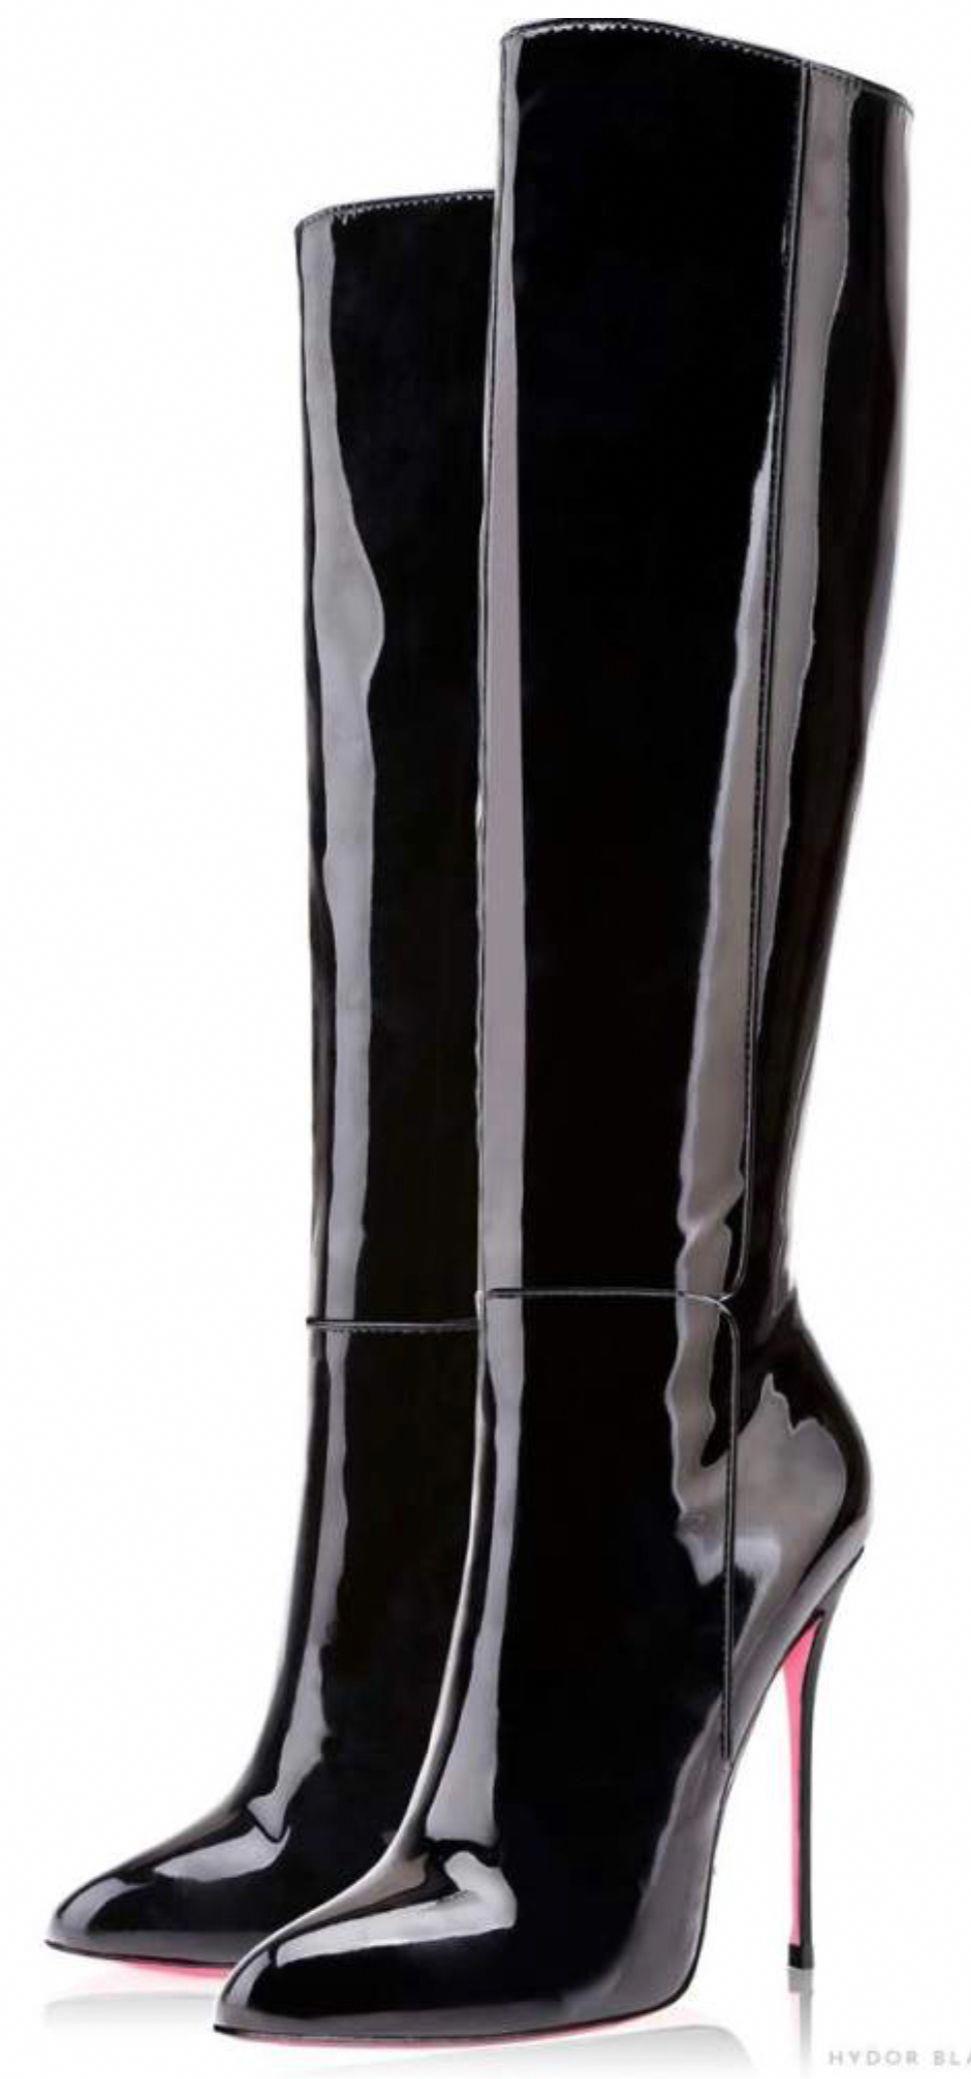 64d4936cdedd Casadei black patent leather stiletto boots stilettoheels extreme jpg  971x2079 Boots black patent stiletto